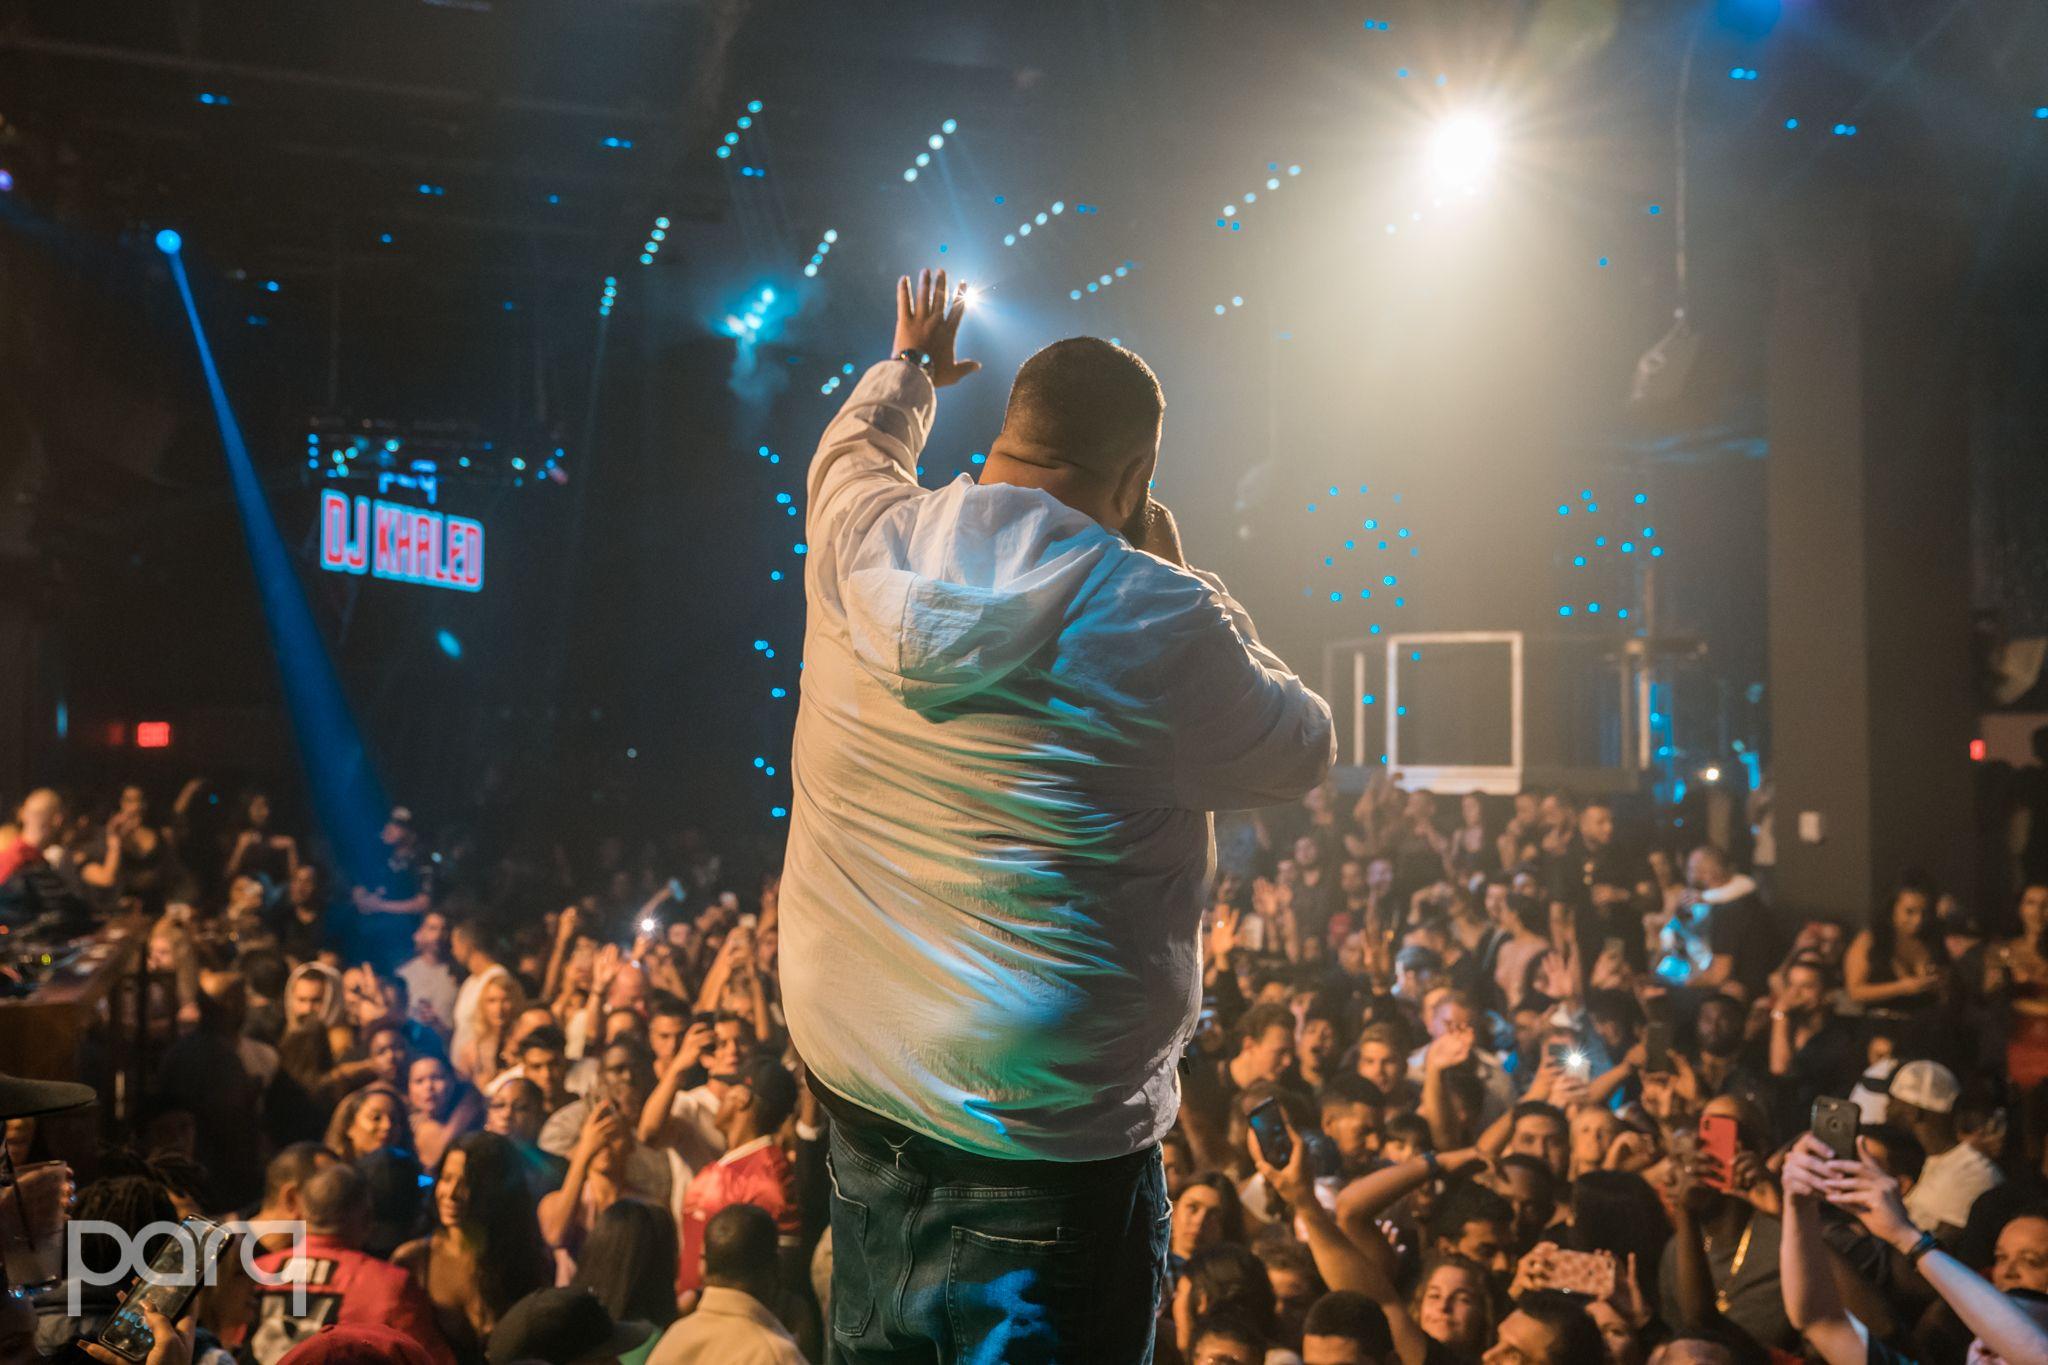 09.27.18 Parq - DJ Khaled-15.jpg